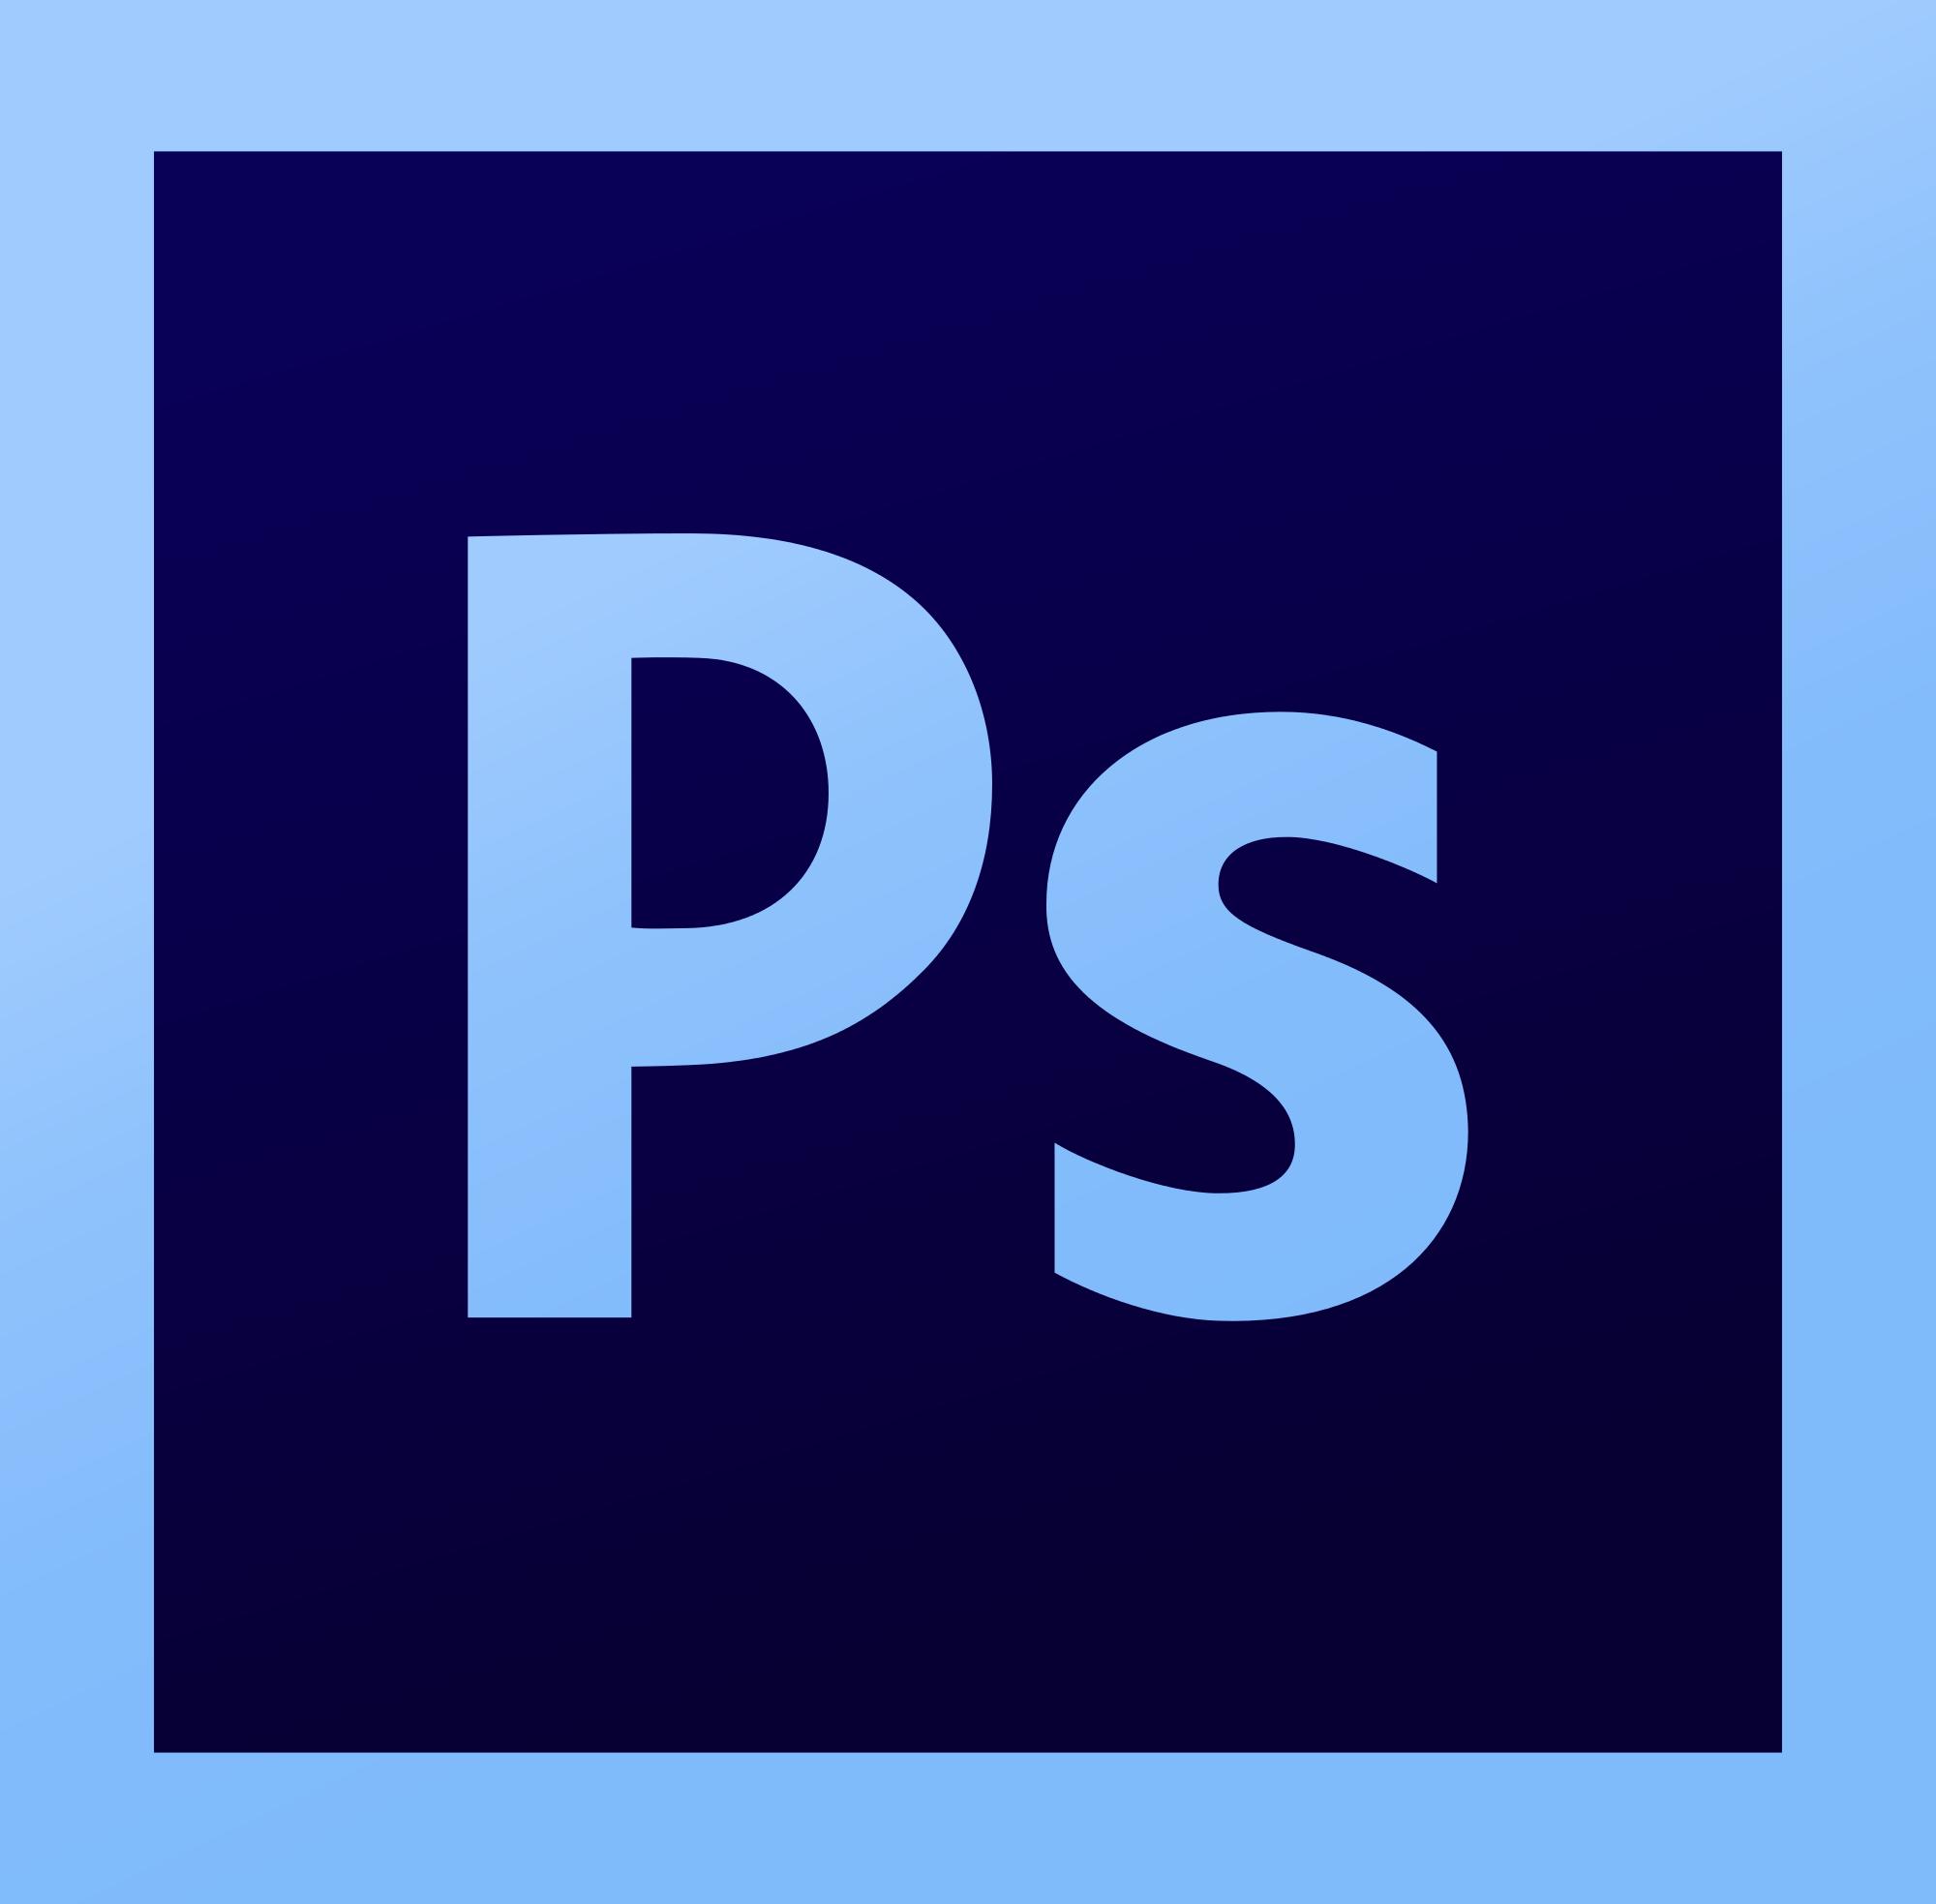 Photoshop Logo PNG Transparent Photoshop Logo.PNG Images.